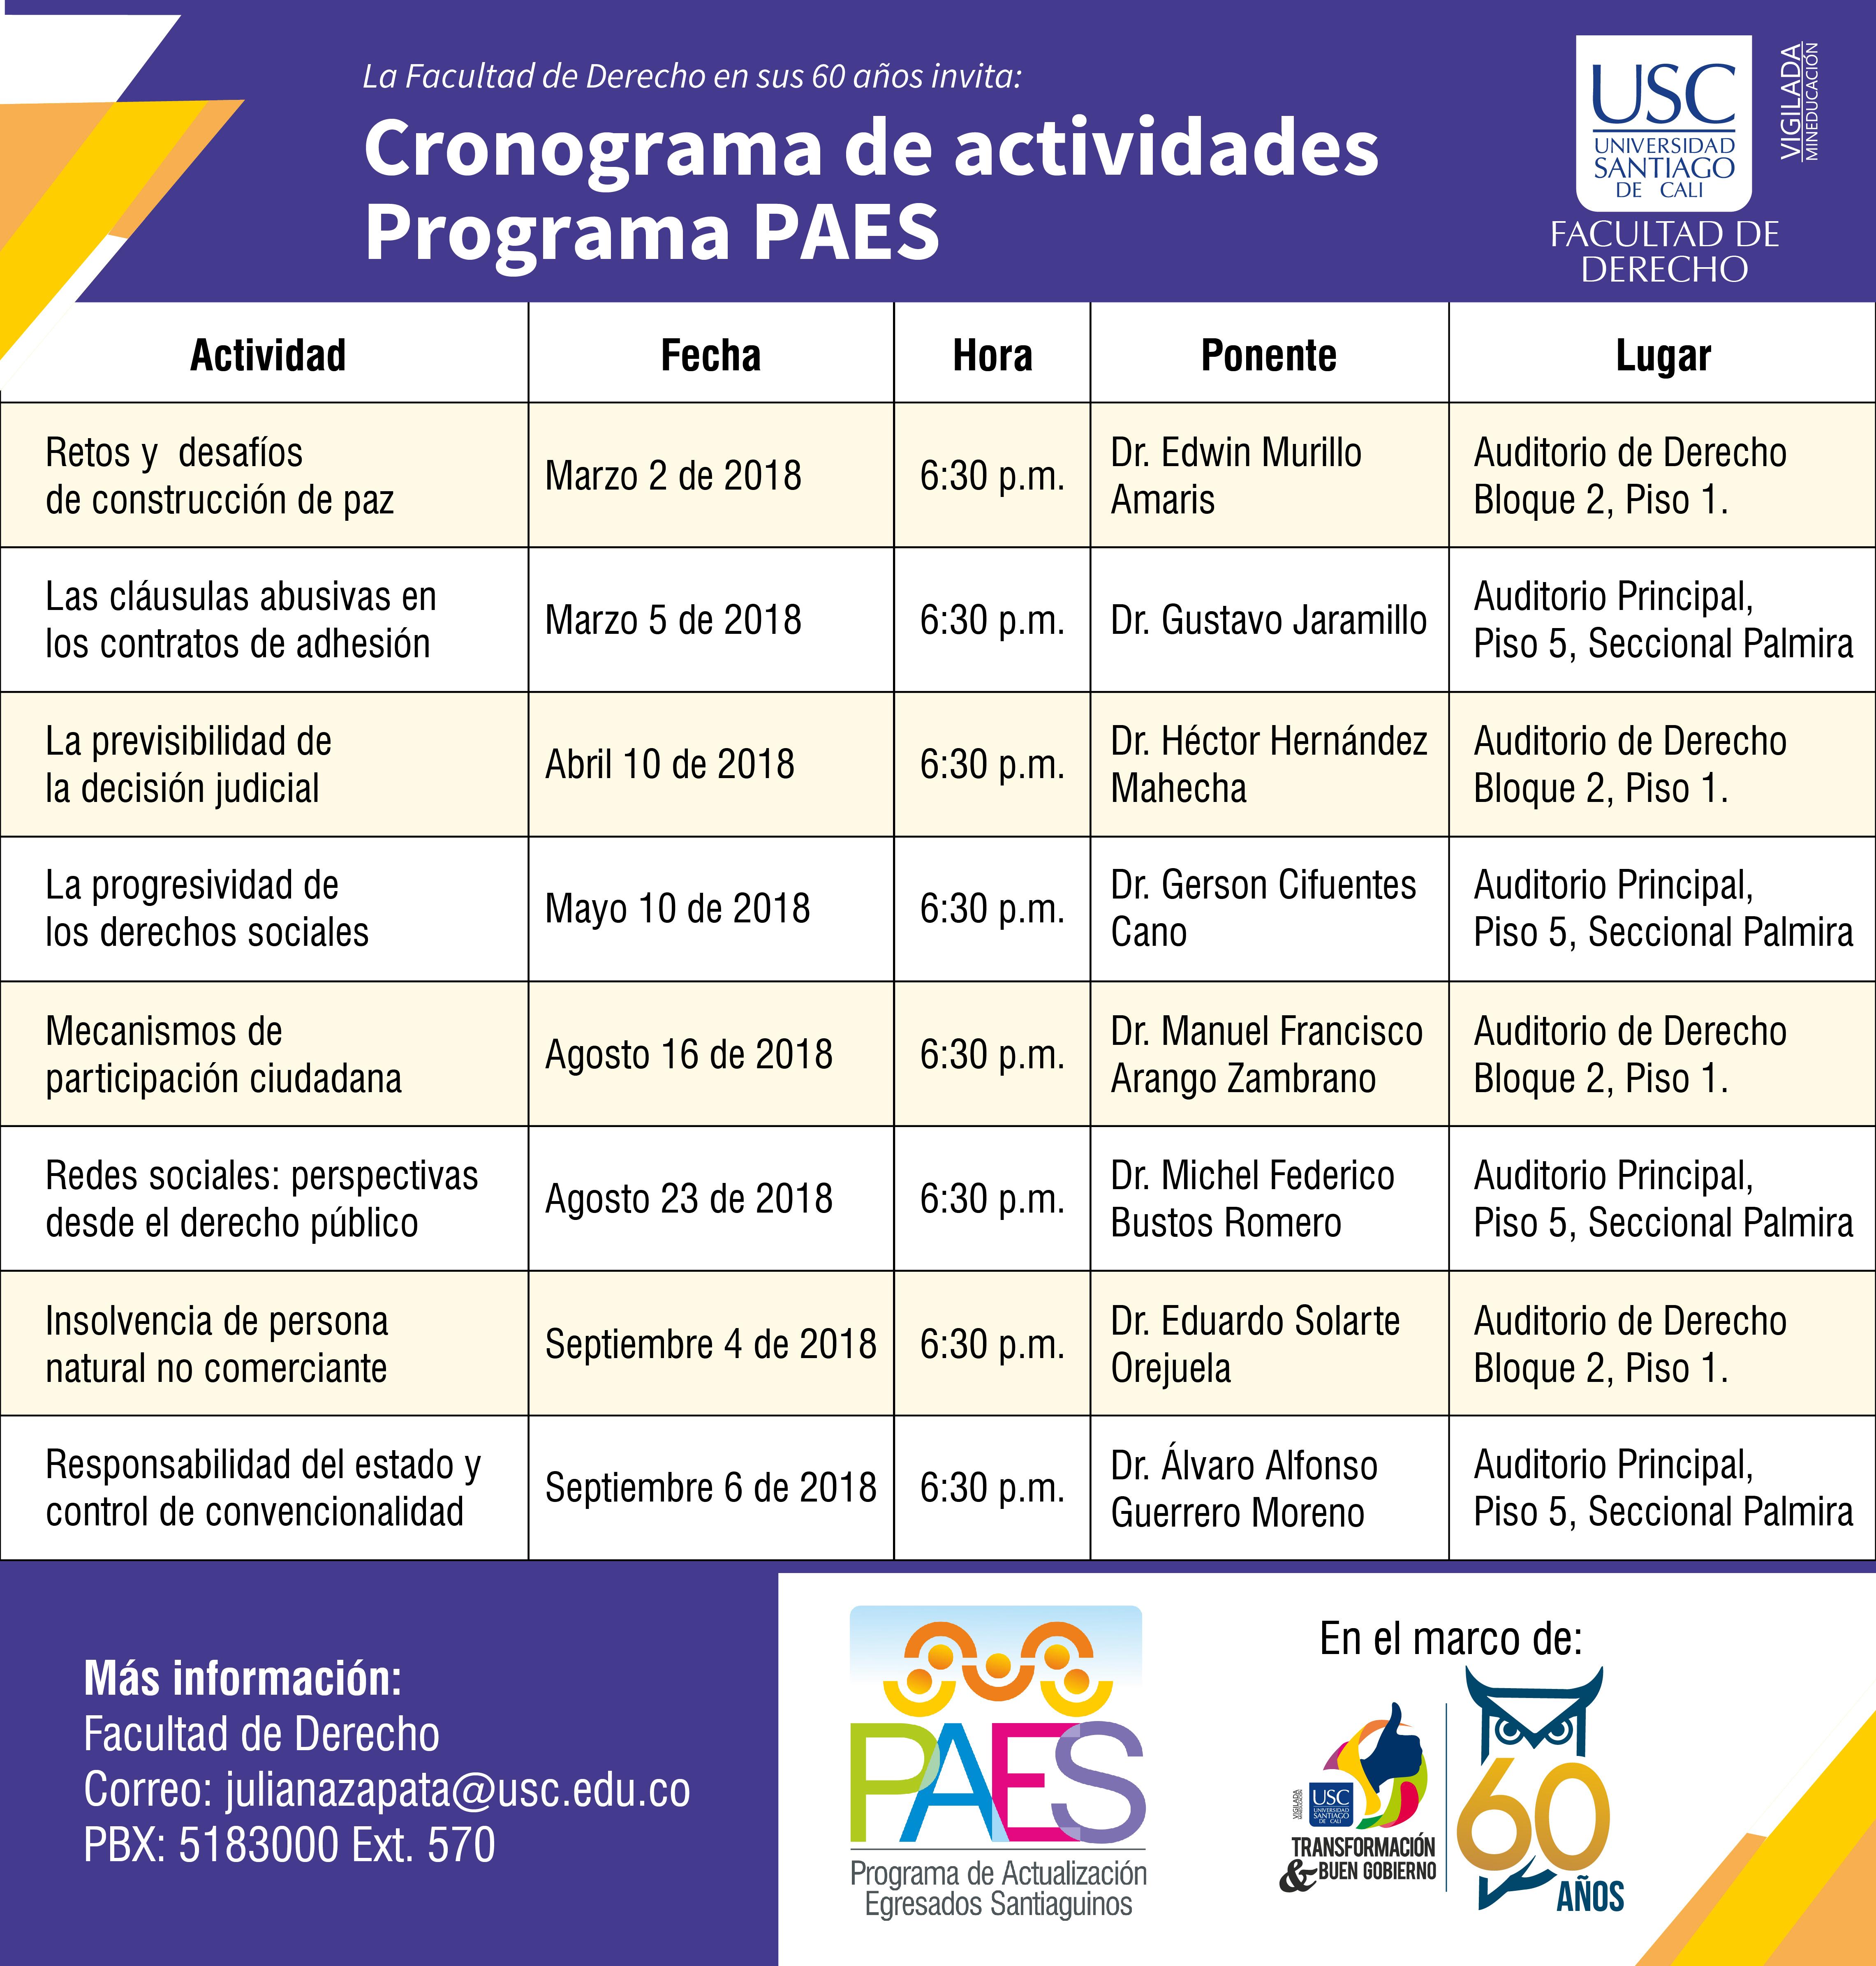 Cronograma De Actividades Programa PAES 02